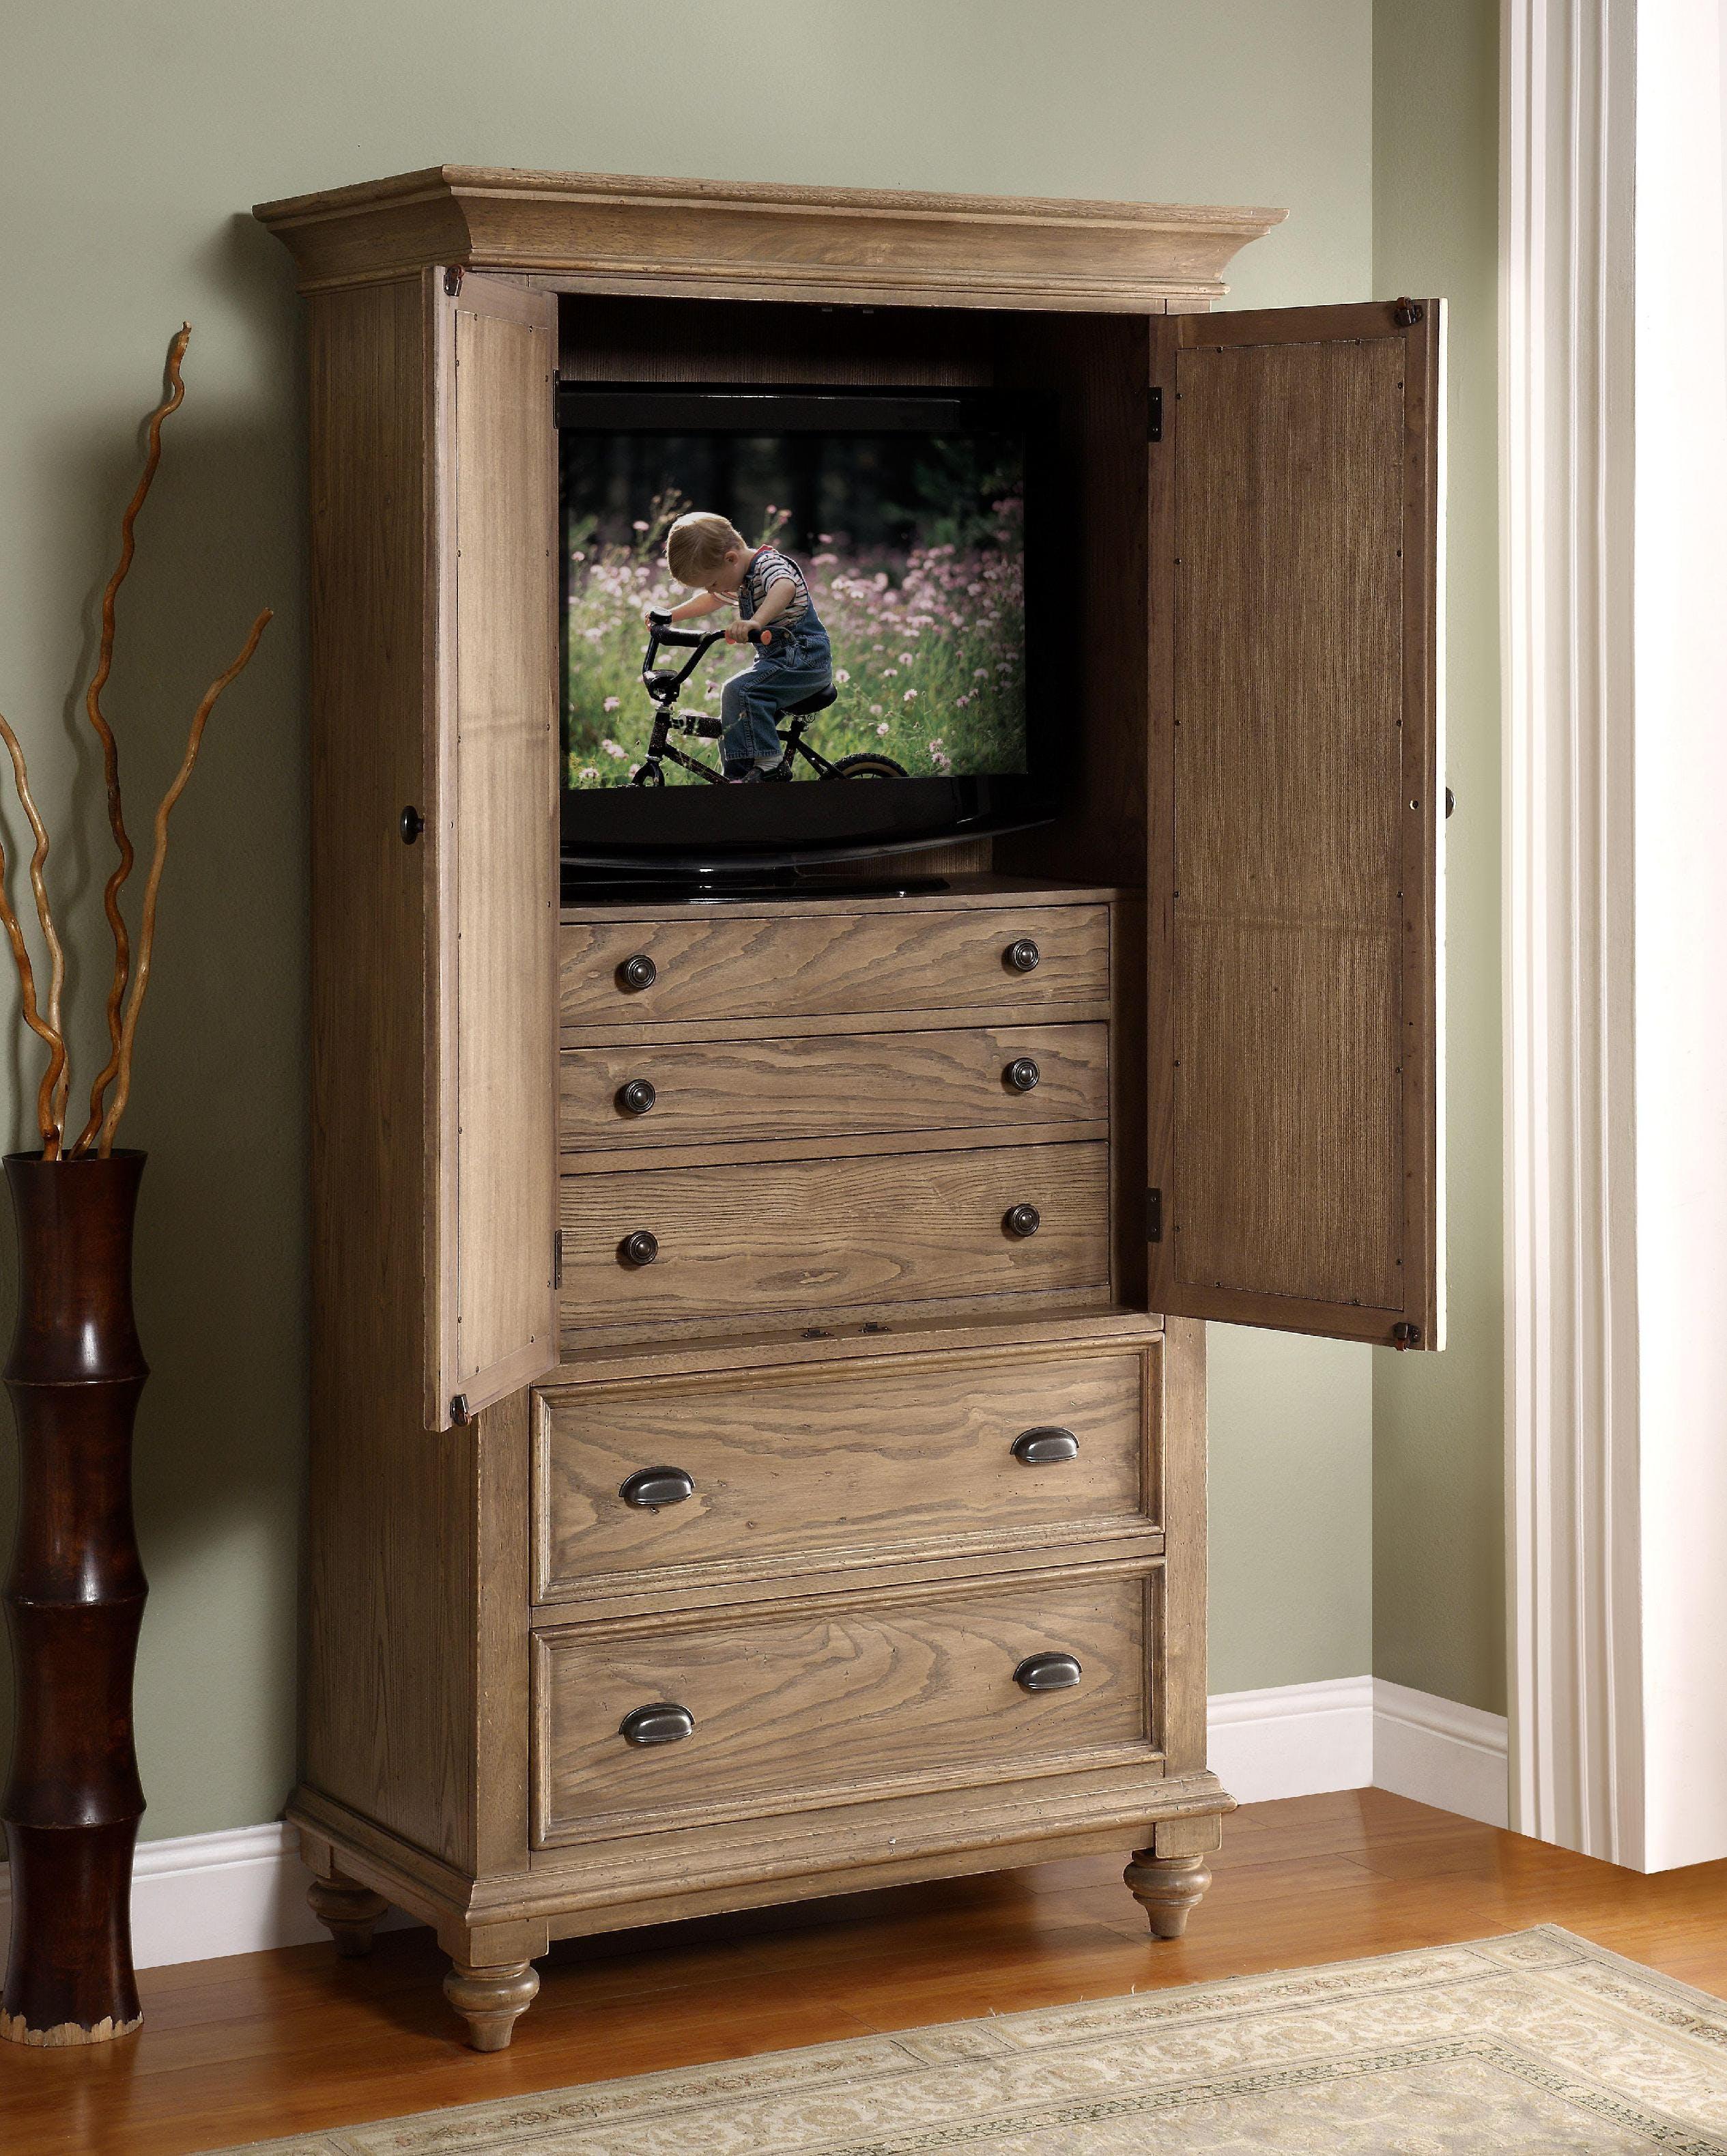 Riverside Bedroom Armoire 32463 - Carol House Furniture - Maryland